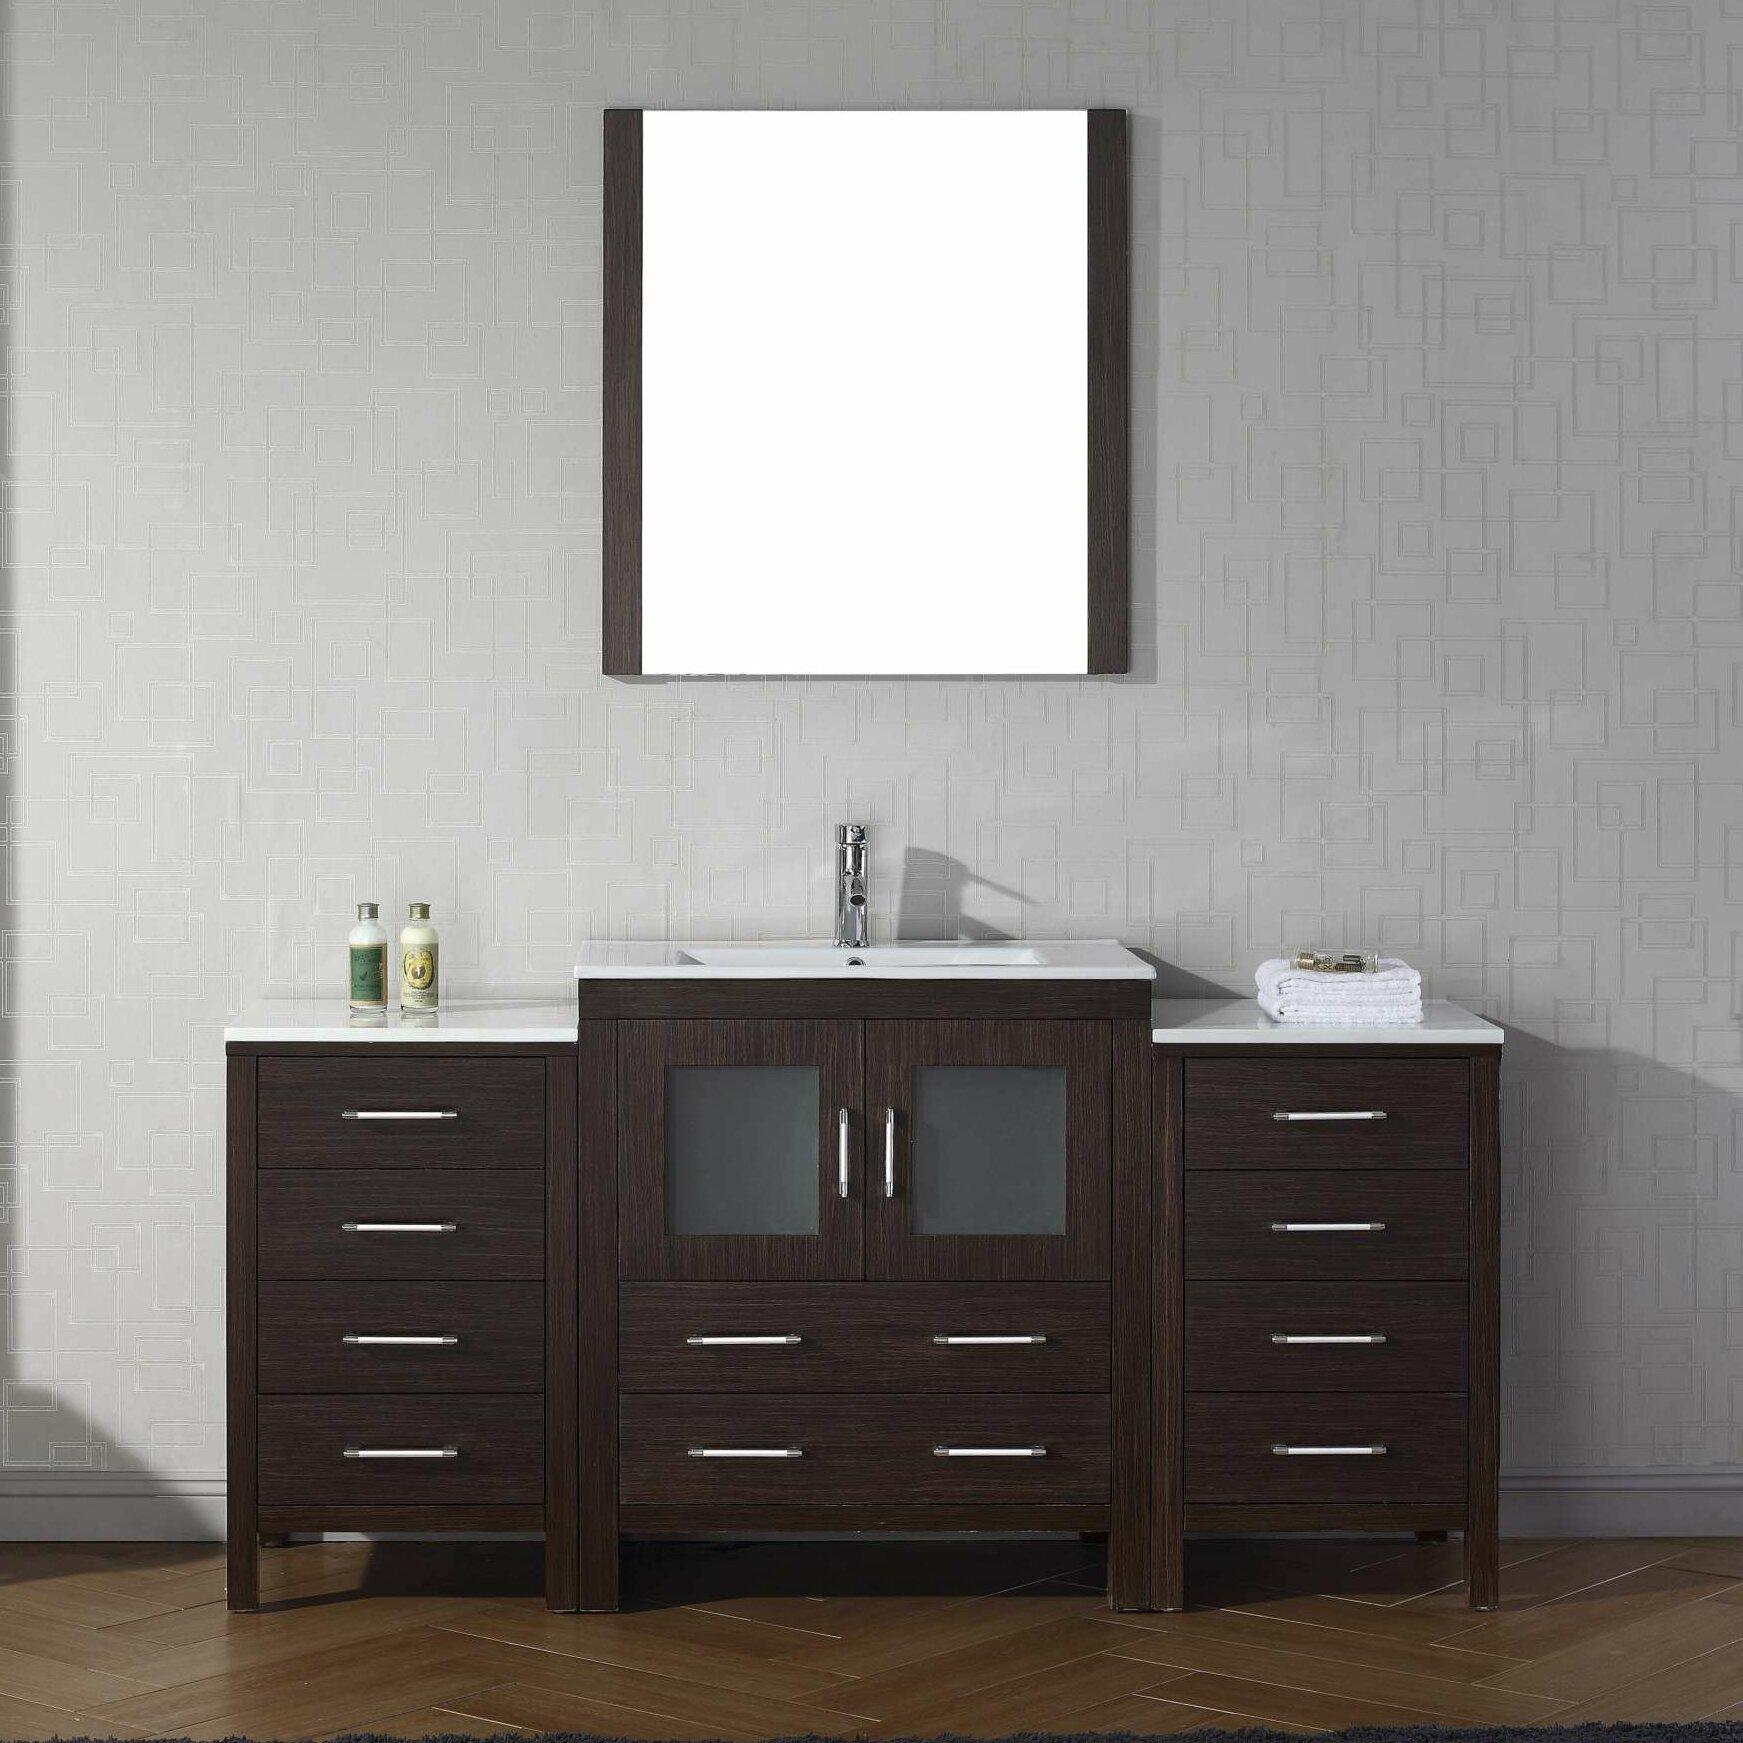 virtu 66 quot single bathroom vanity set with mirror